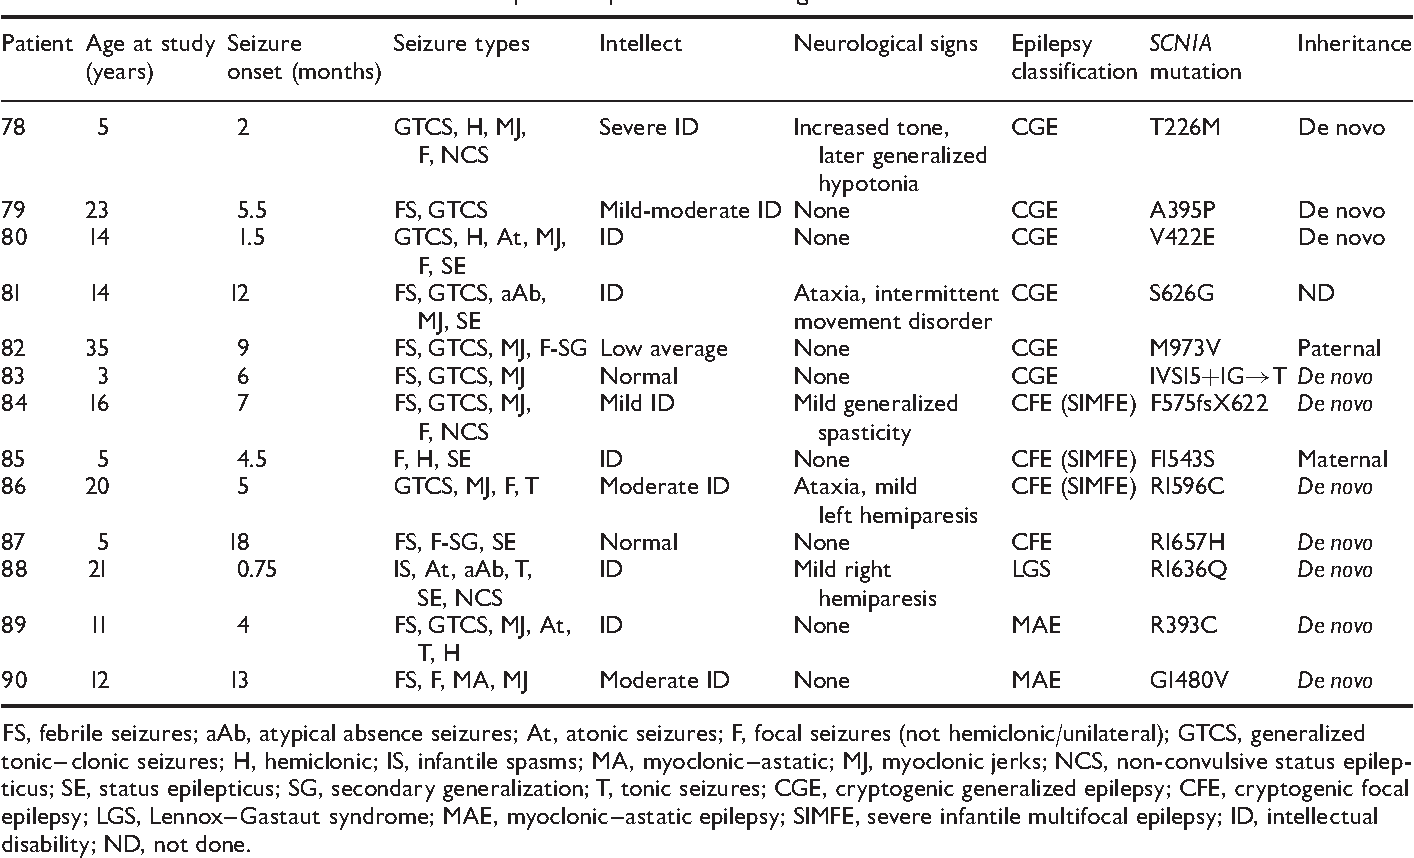 Infantile Severe Myoclonic Epilepsy - Semantic Scholar